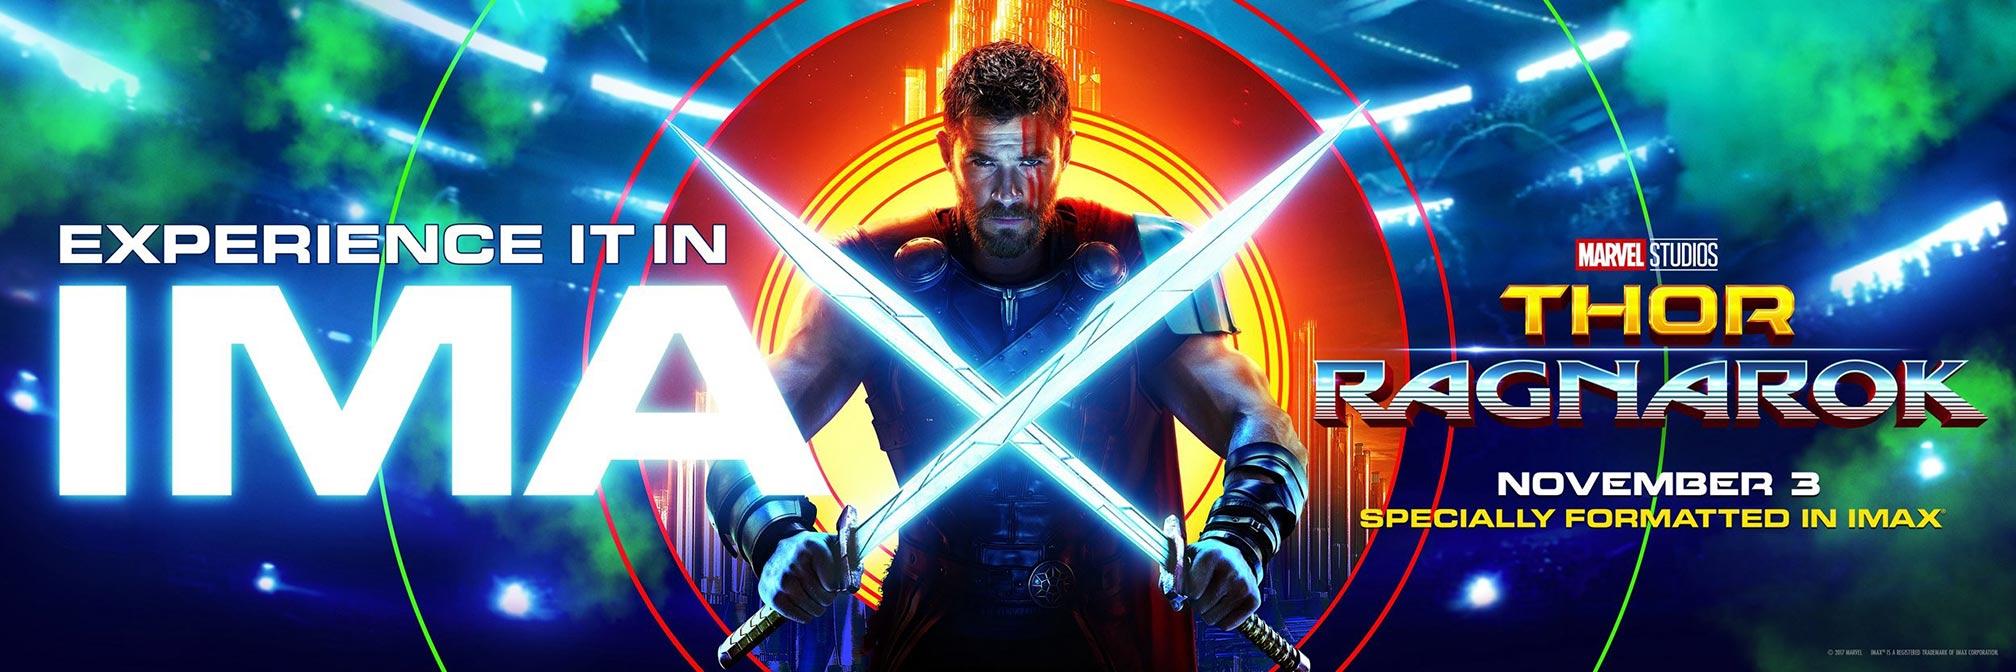 Thor: Ragnarok Poster #16